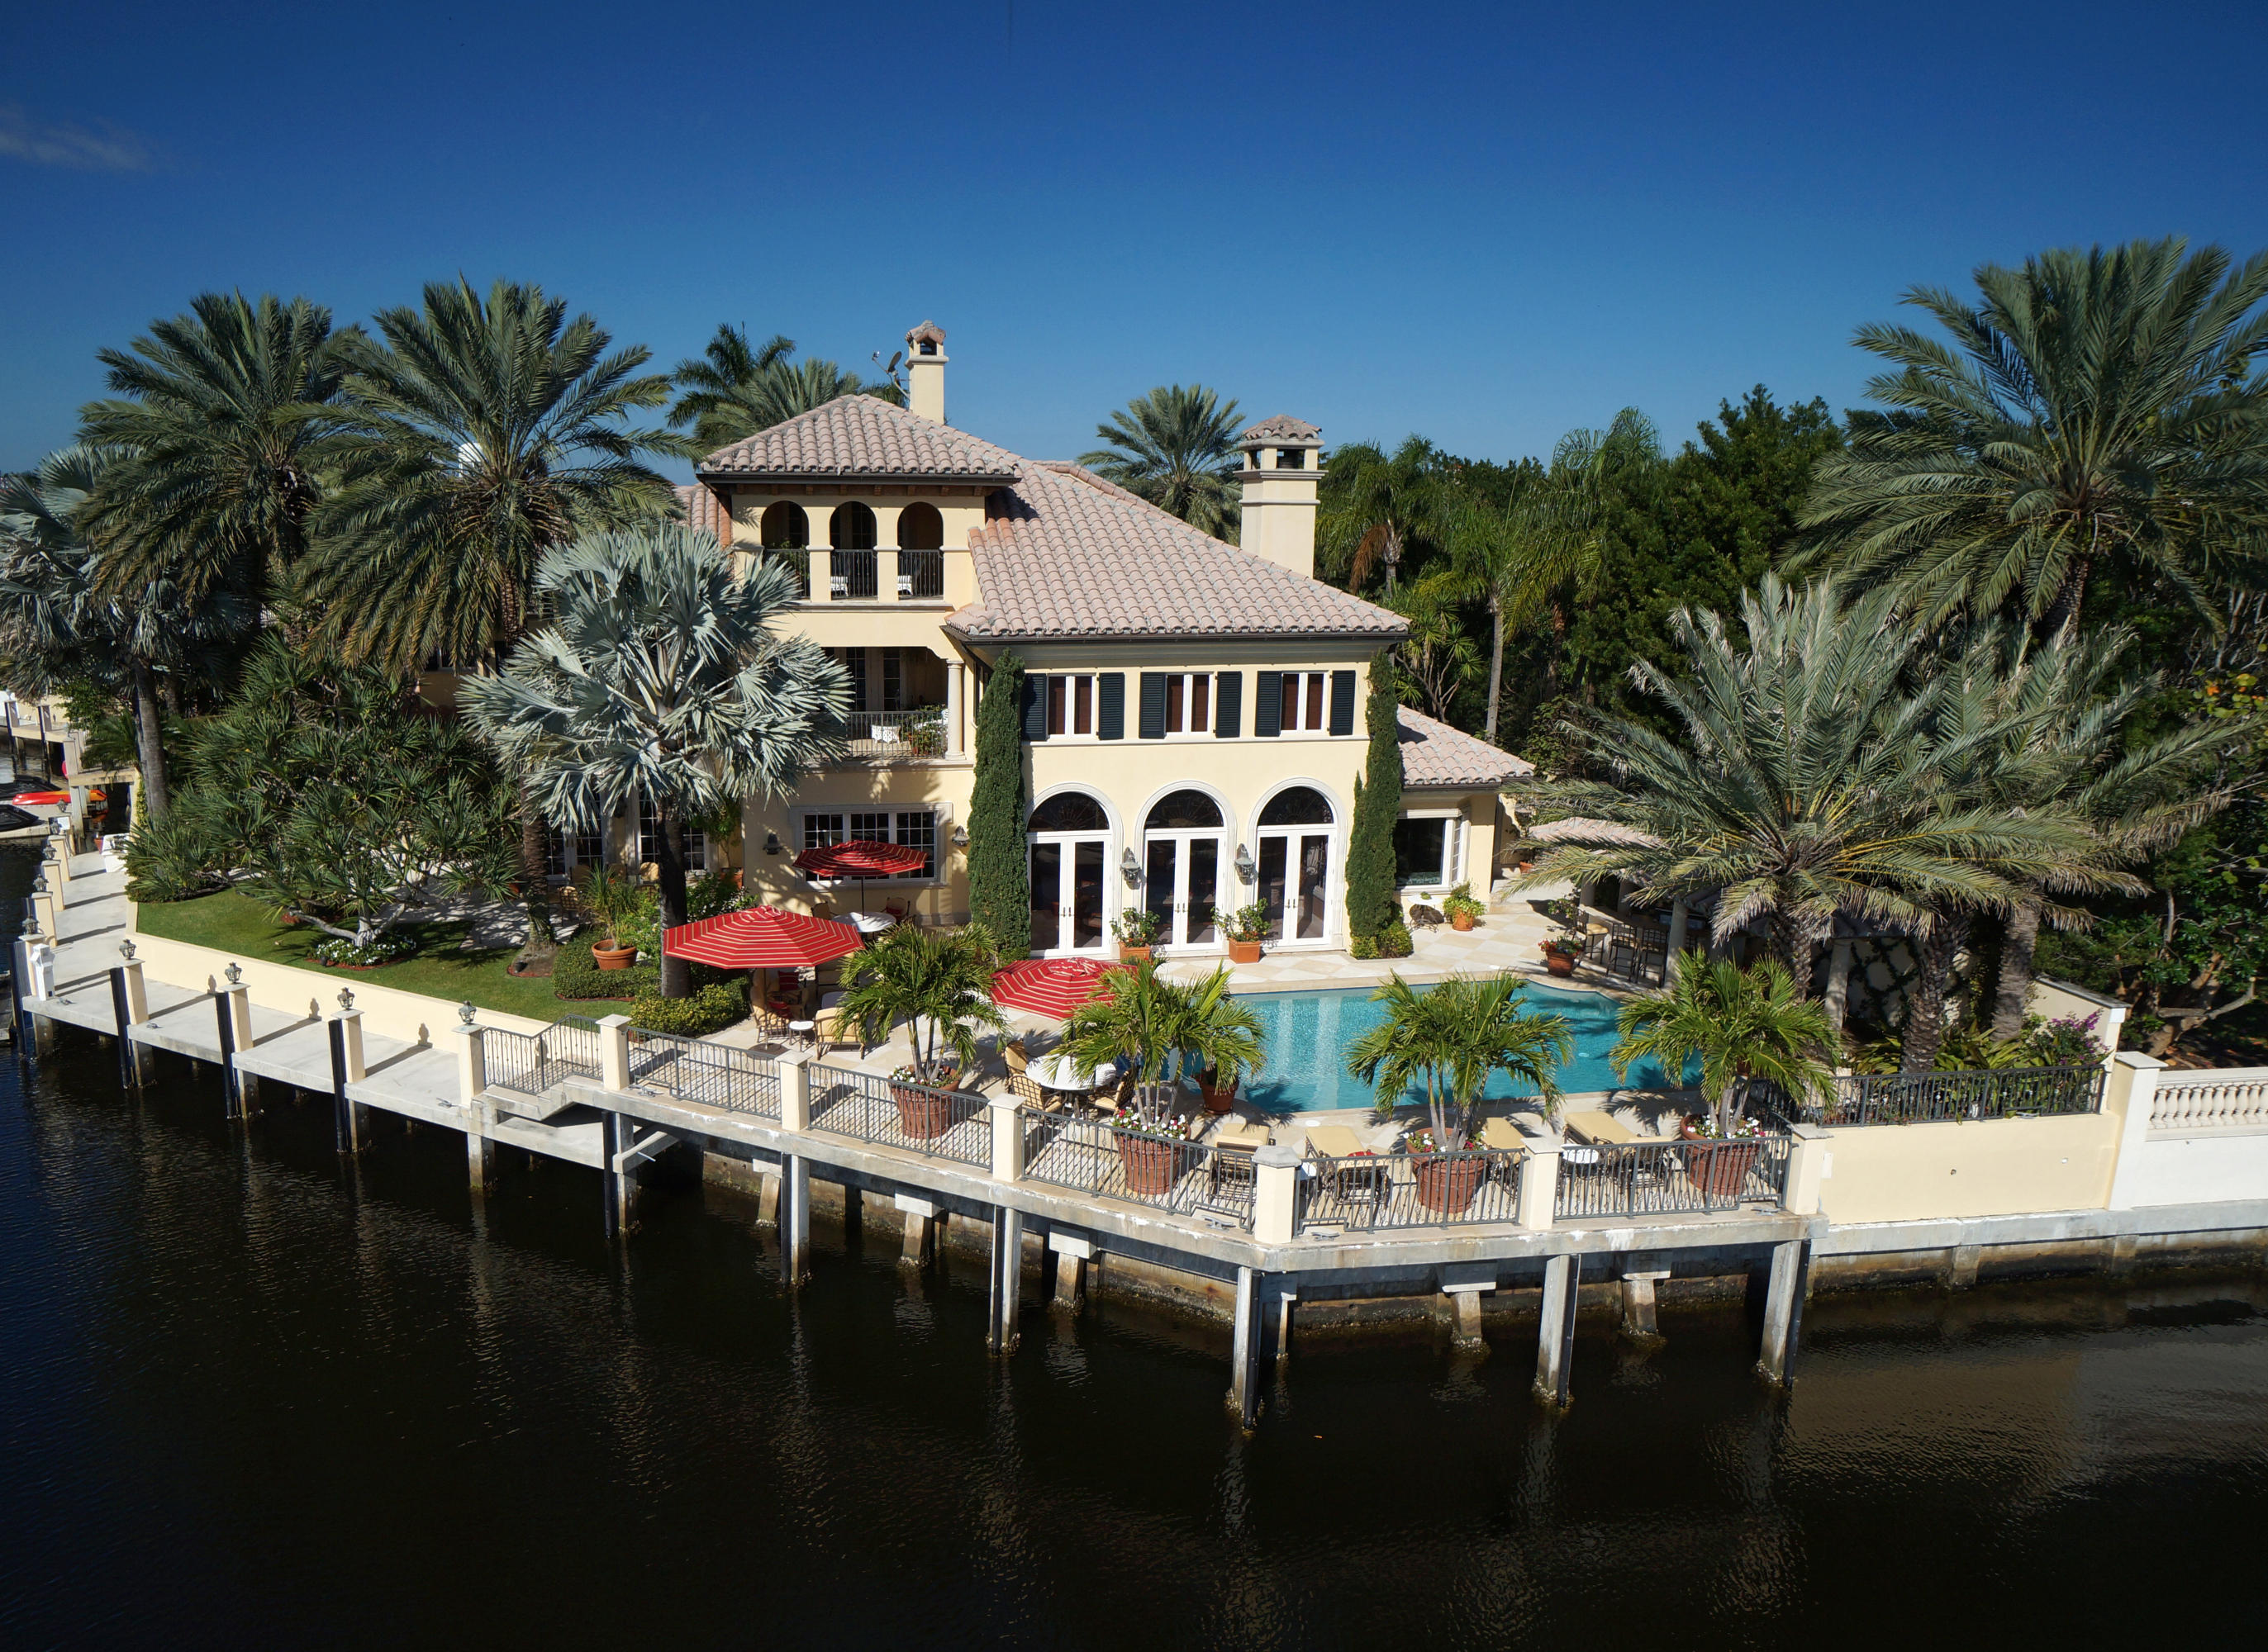 4060 Ibis Point Circle, Boca Raton, Florida 33431, 5 Bedrooms Bedrooms, ,6.2 BathroomsBathrooms,Single Family,For Sale,The Sanctuary,Ibis Point,RX-10012302